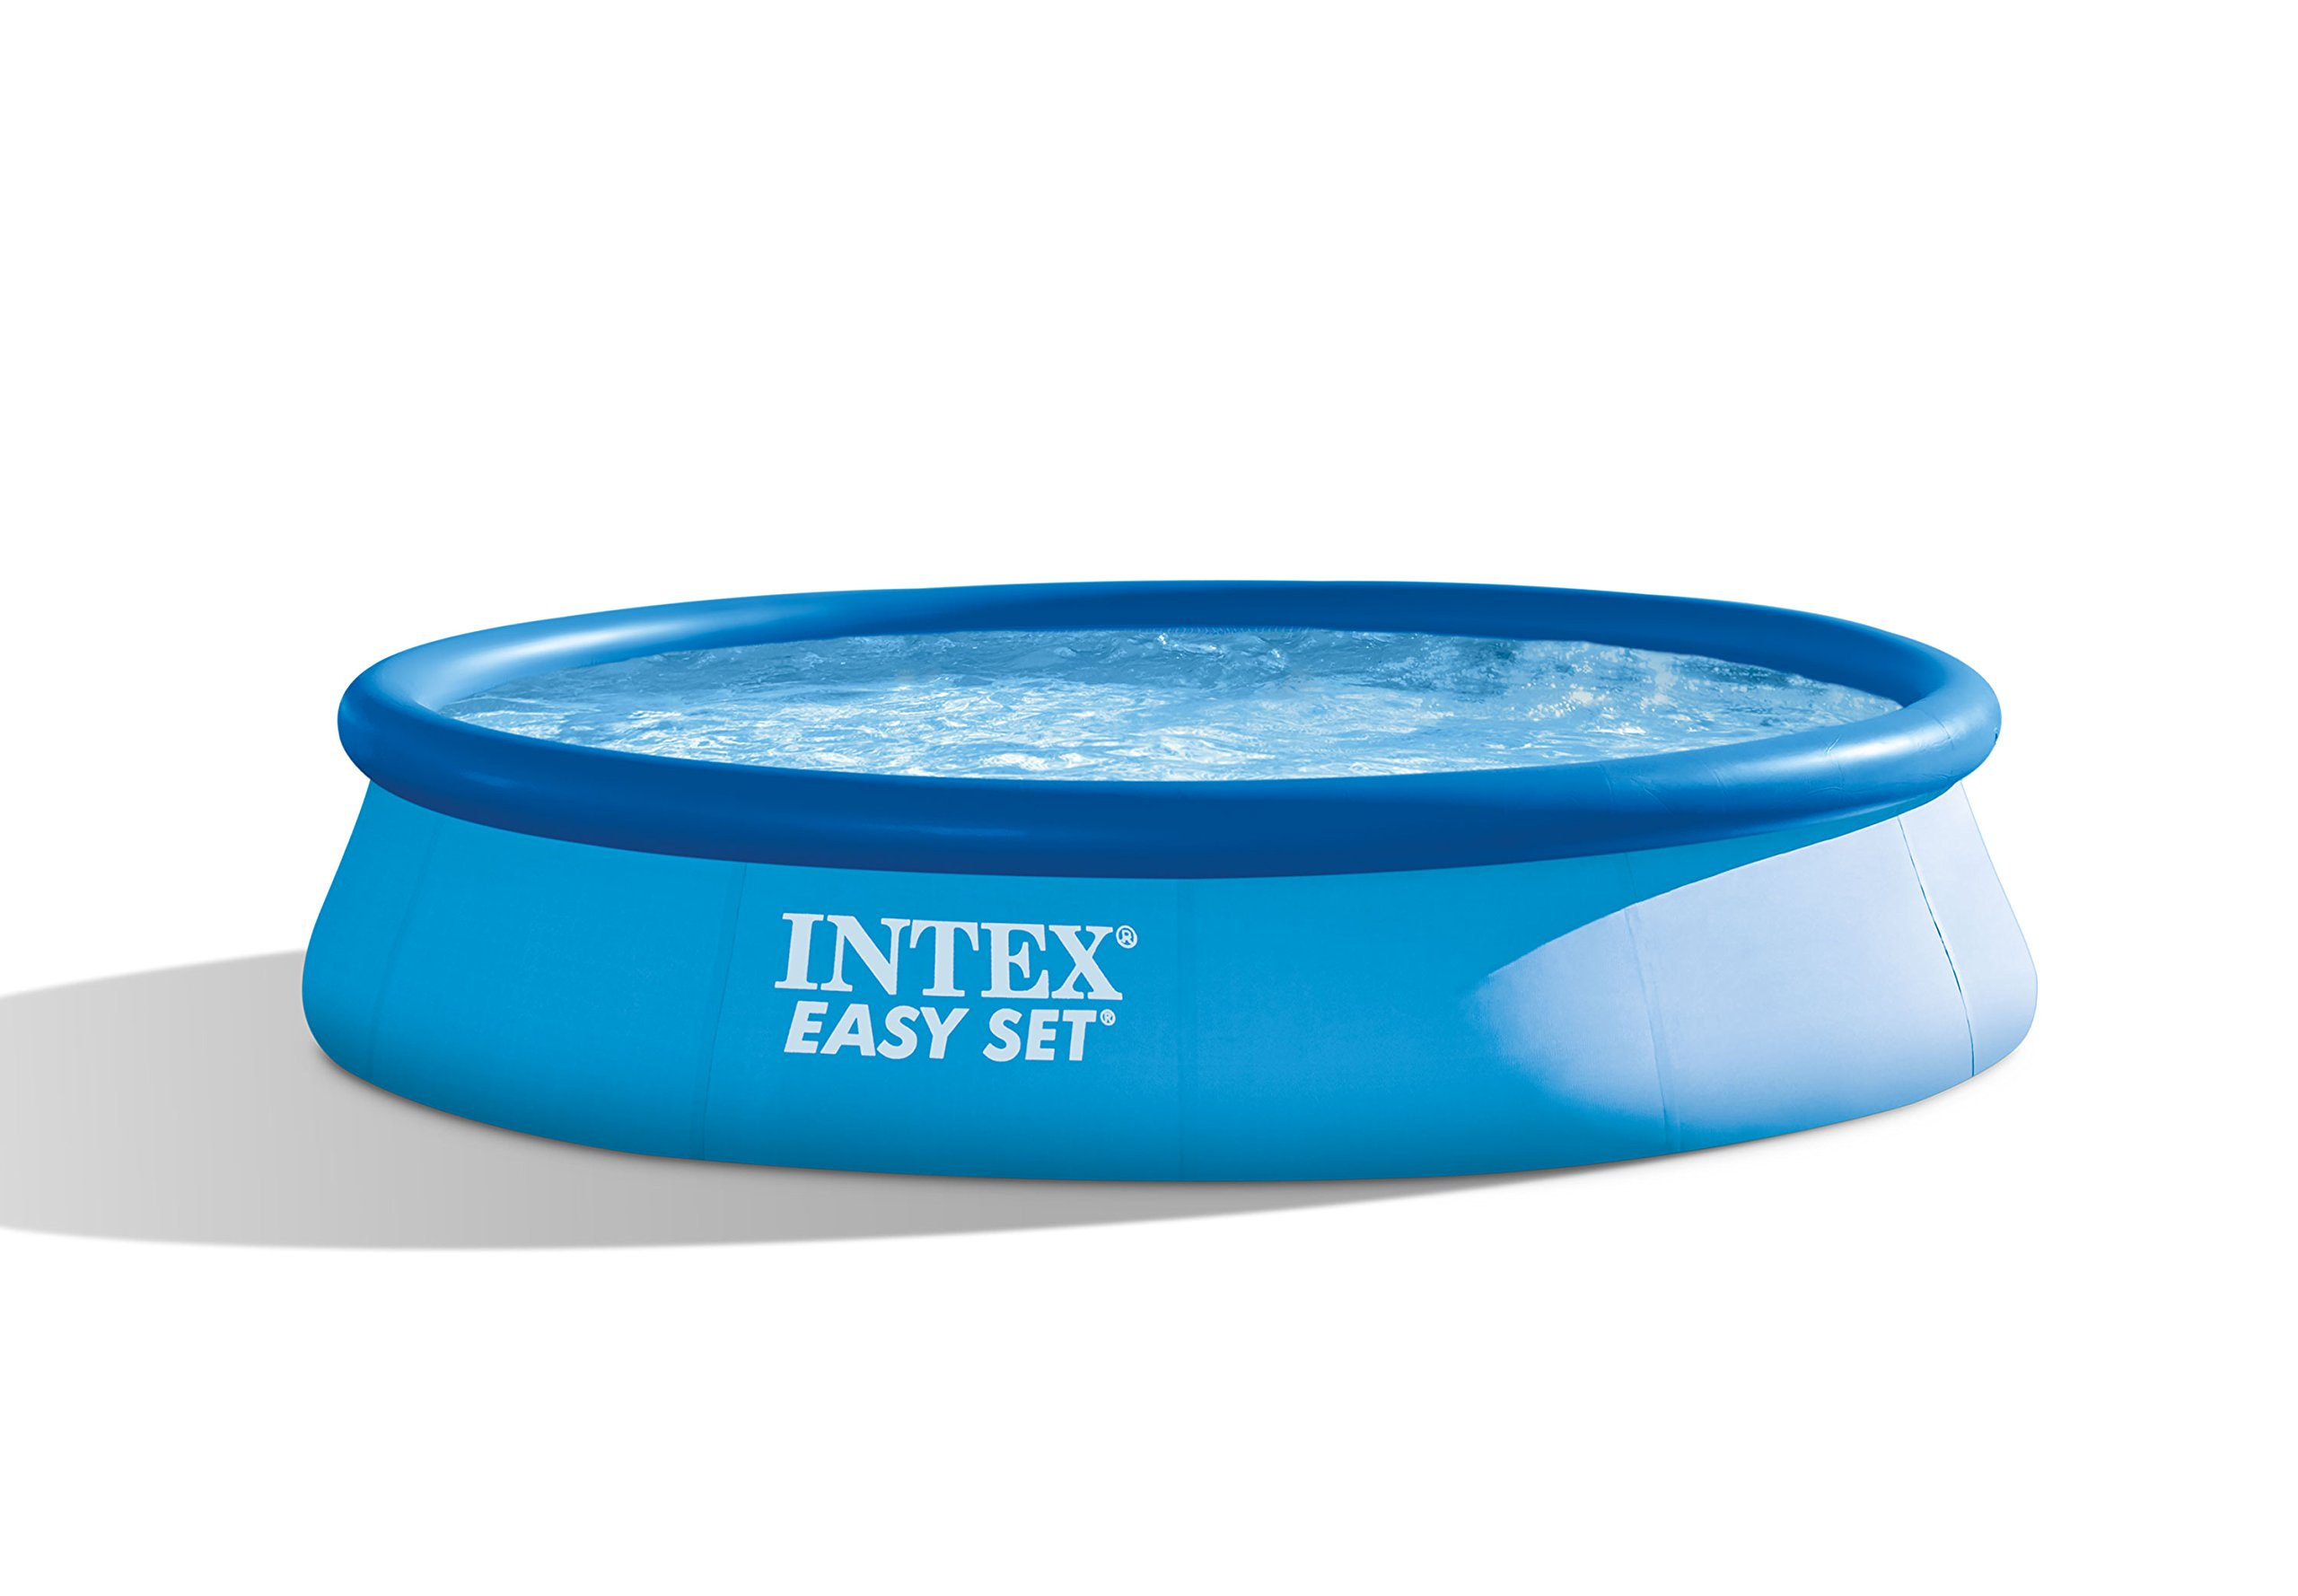 Intex Recreation 28143EH 13'x33 Easy Set Pool Set Toy by Intex (Image #1)